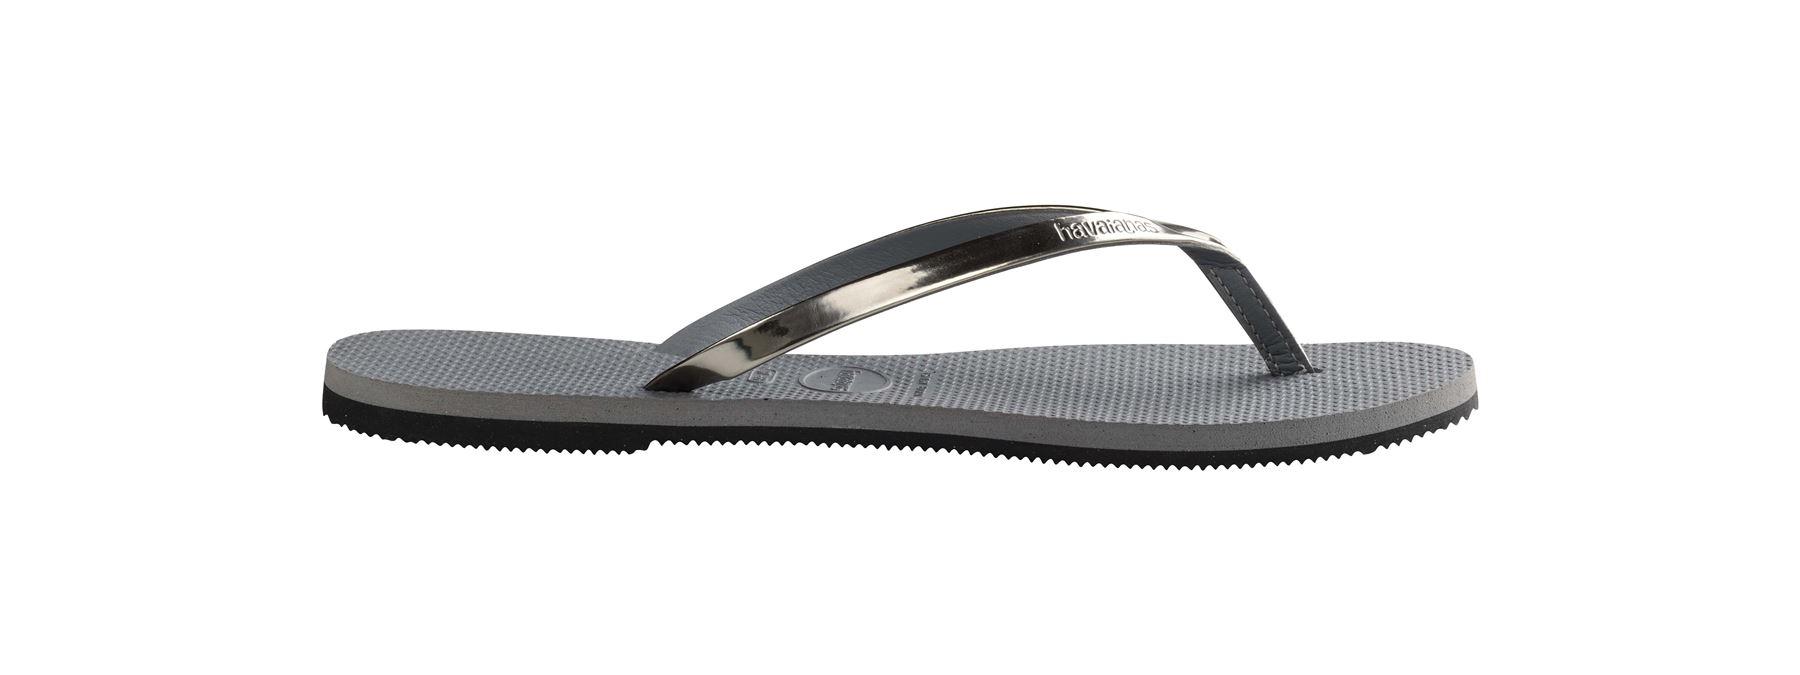 Havaianas-You-Metallic-Flip-Flops-Women-Summer-Beach-Sandals-Wide-Range-Colours miniature 15